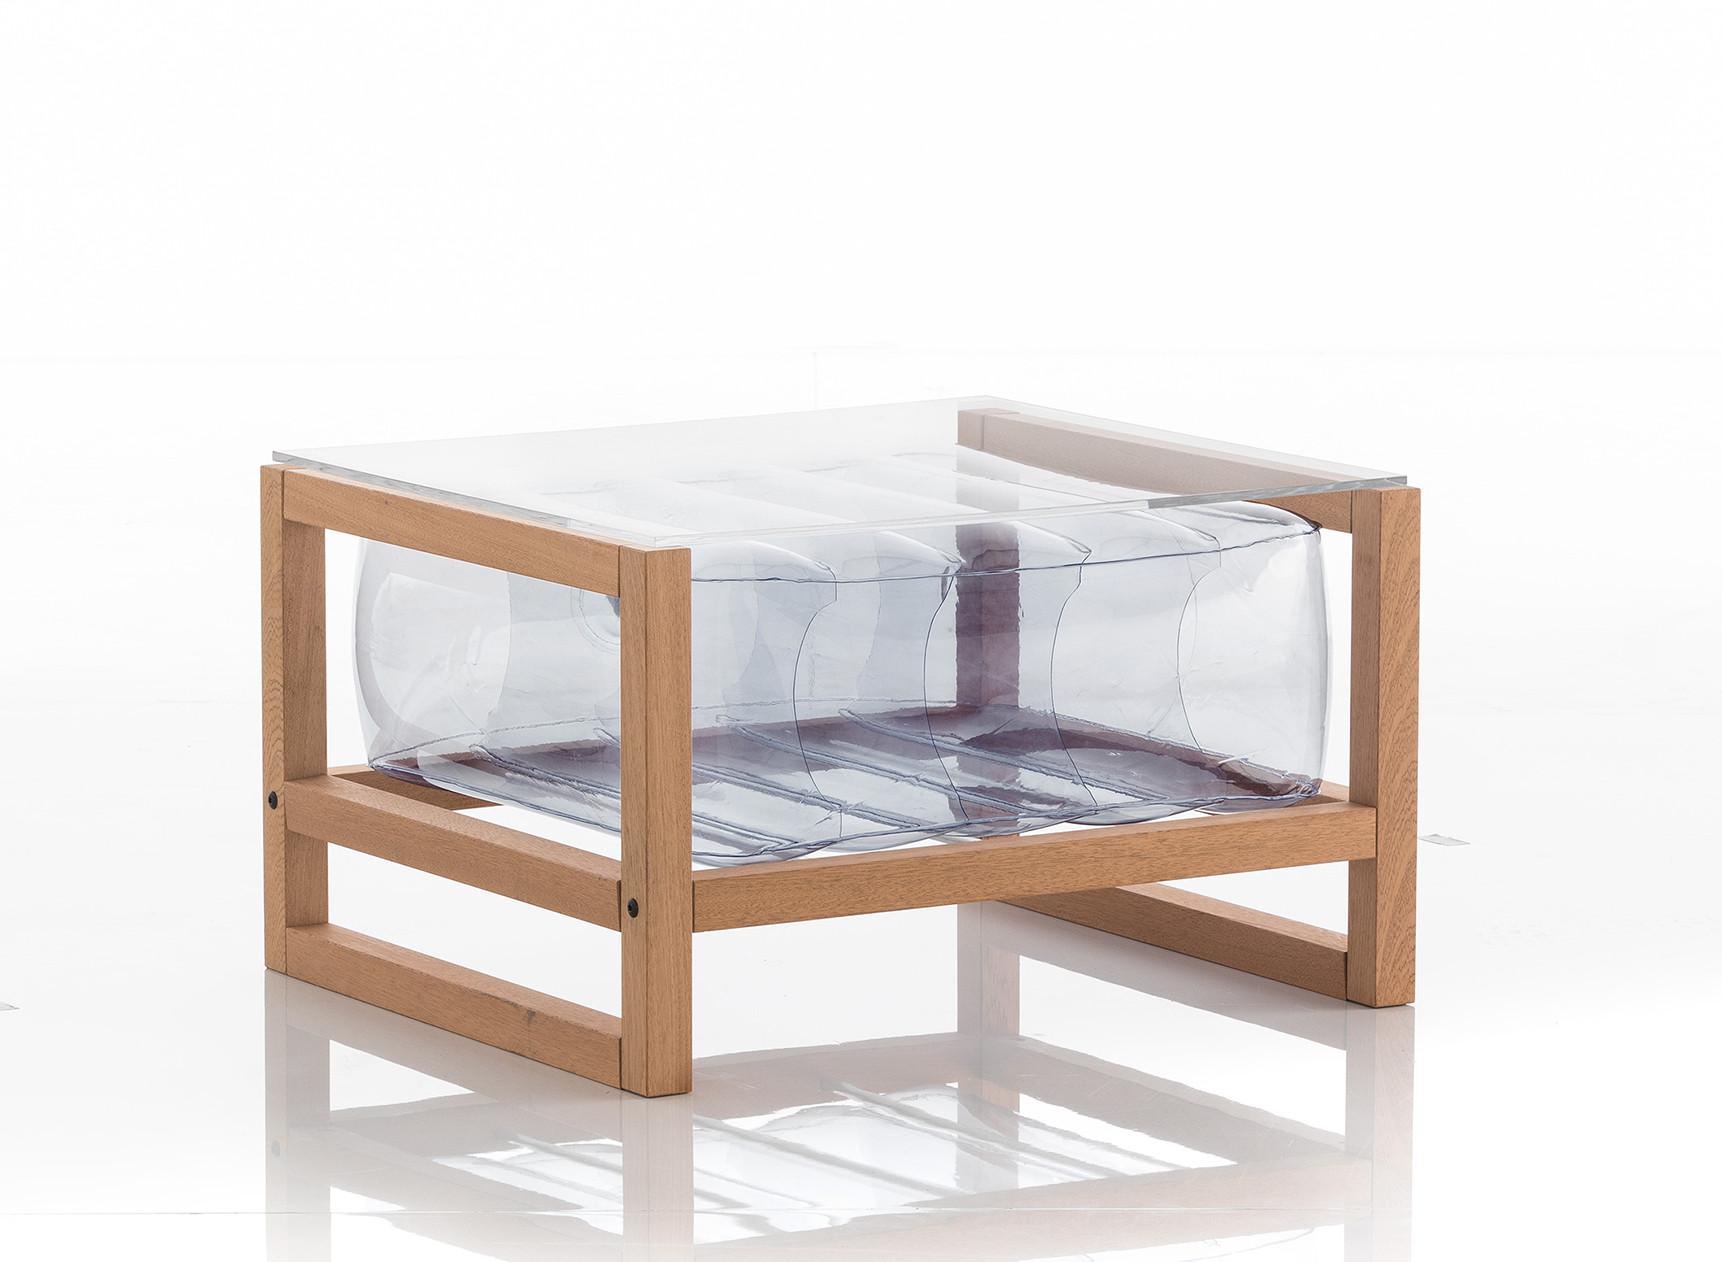 Table basse Design YOKO by MOJOW Nateo Concept - 6